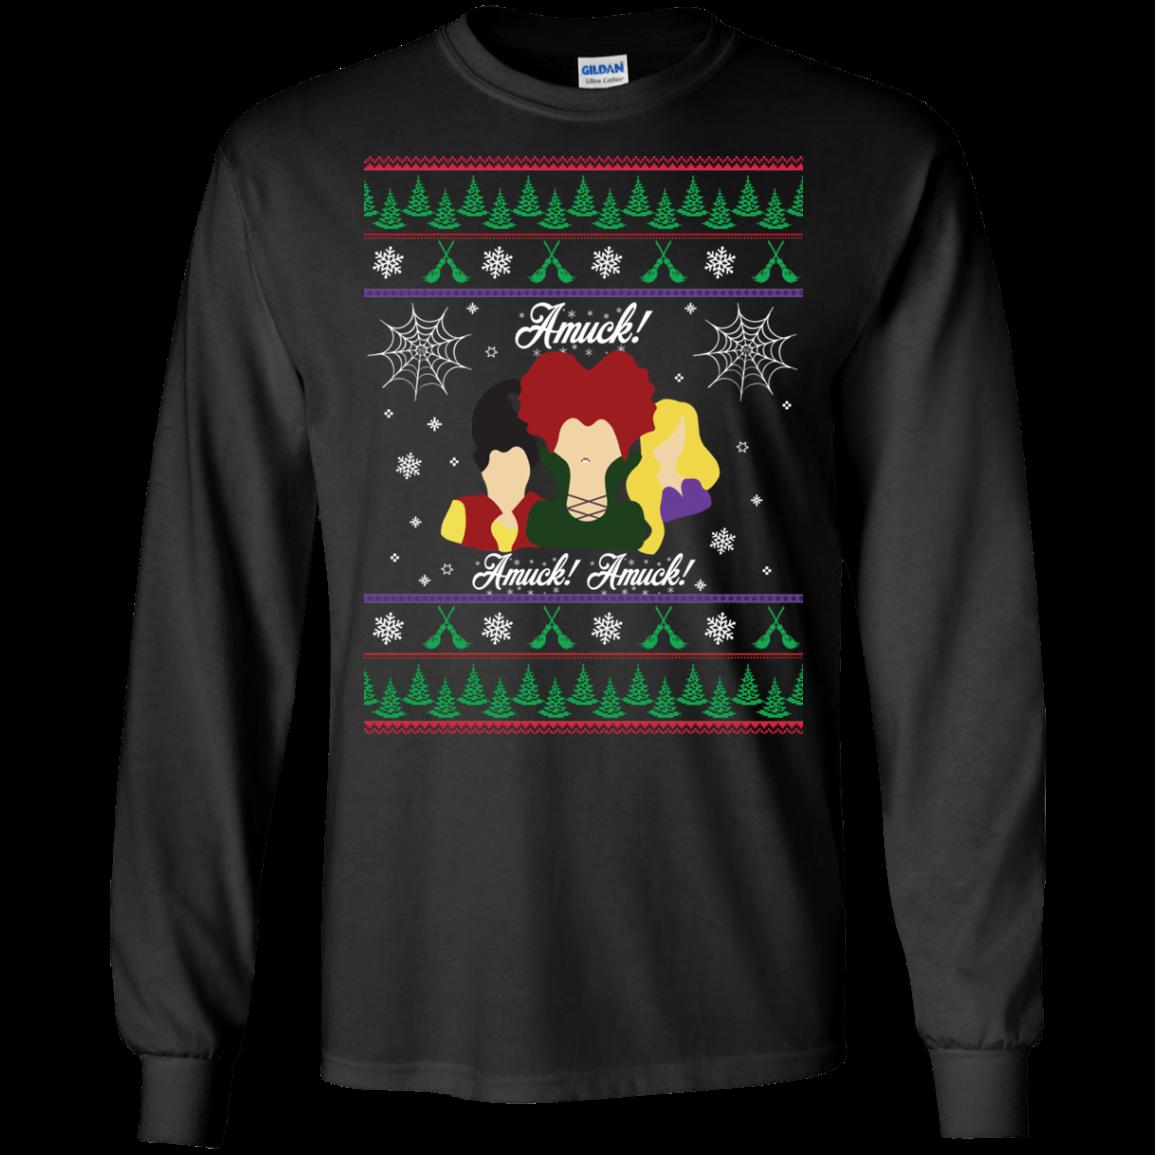 Dan And Phil Christmas Sweater.Hocus Pocus Amuck Halloween Christmas Sweater Tshirt